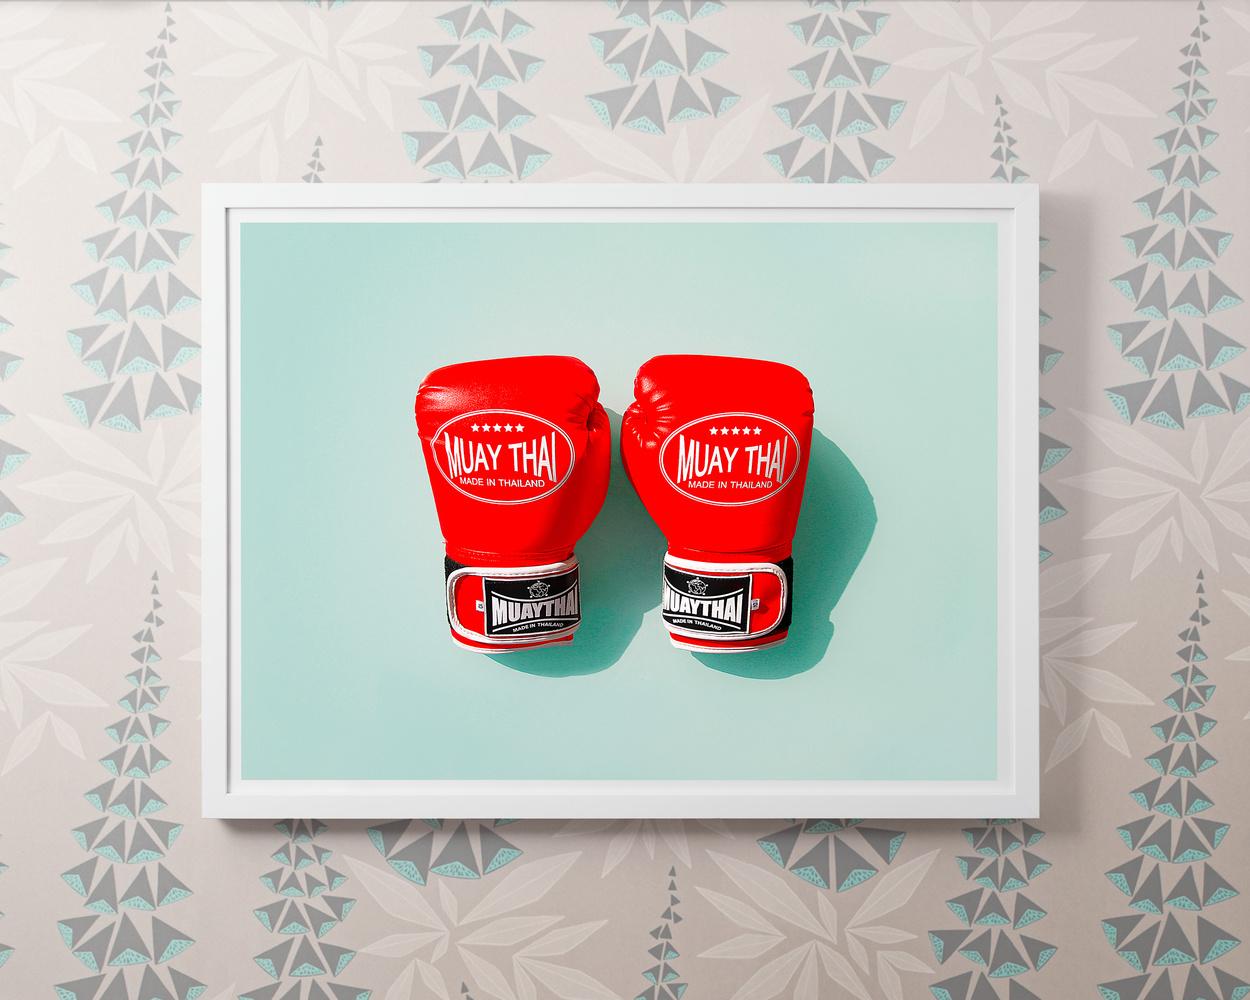 Boxing Gloves by Josh Koll